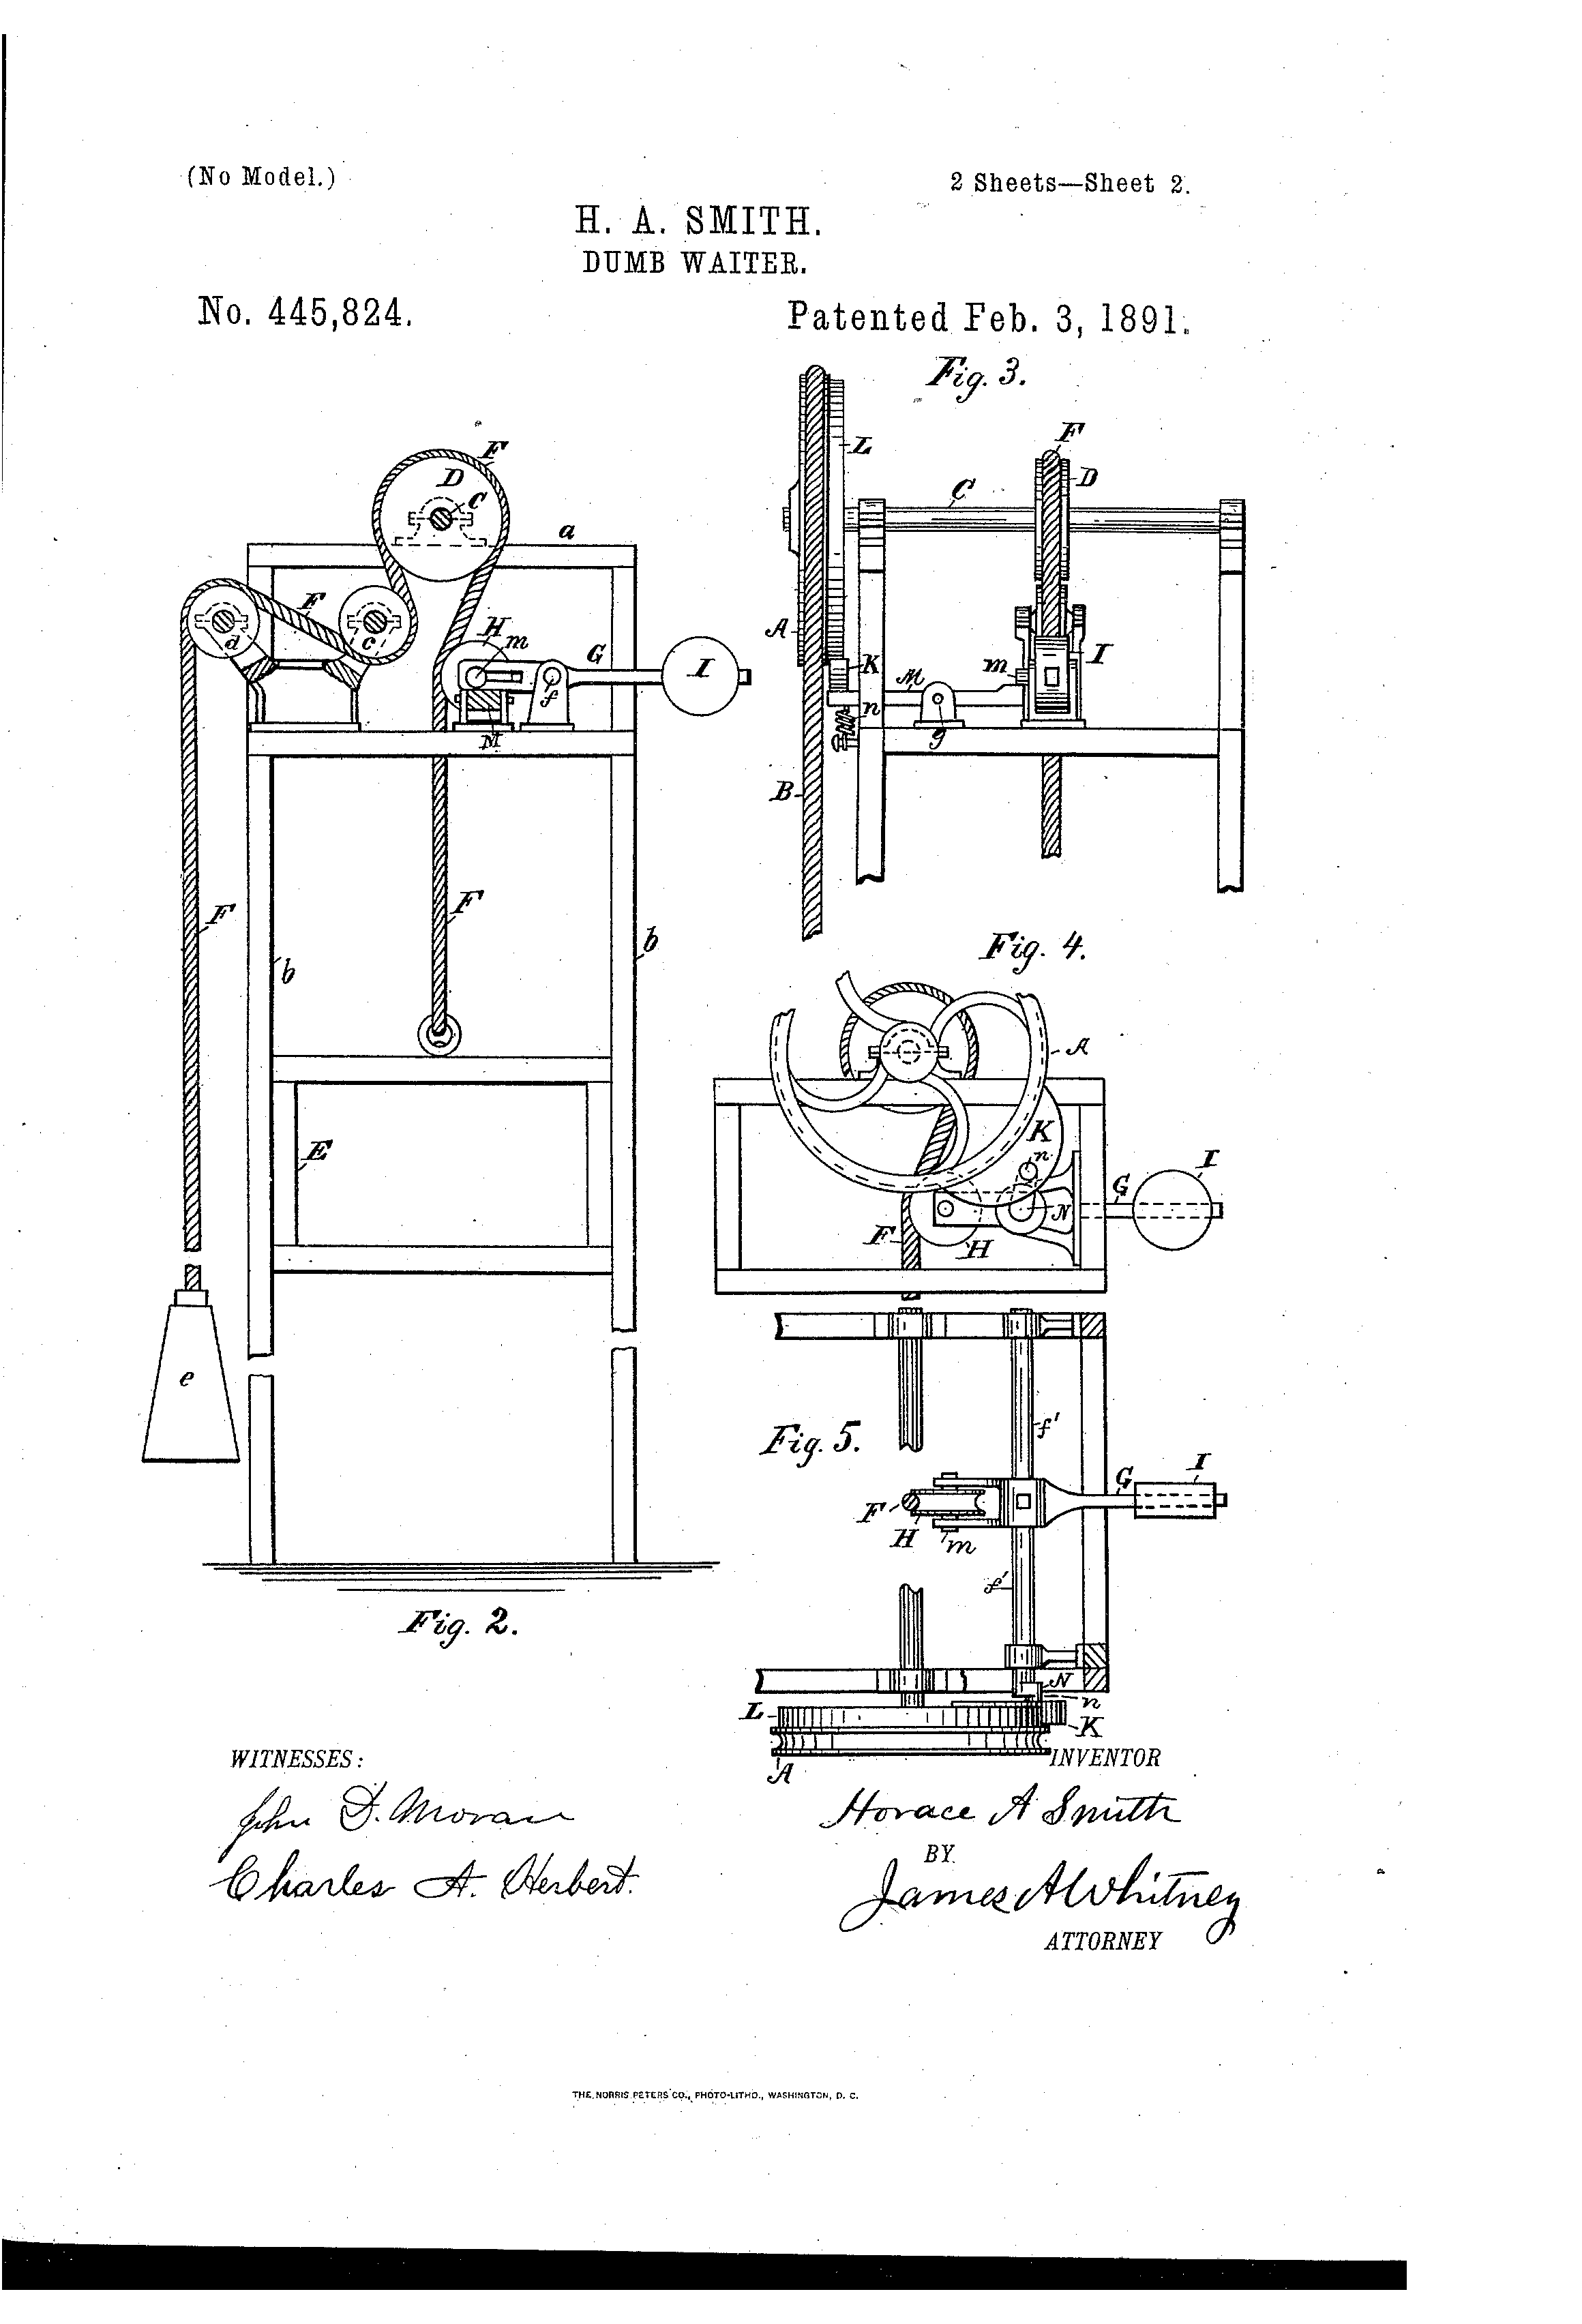 Us445824a Dumb Waiter Patent Drawing Dumb Waiter House Elevation